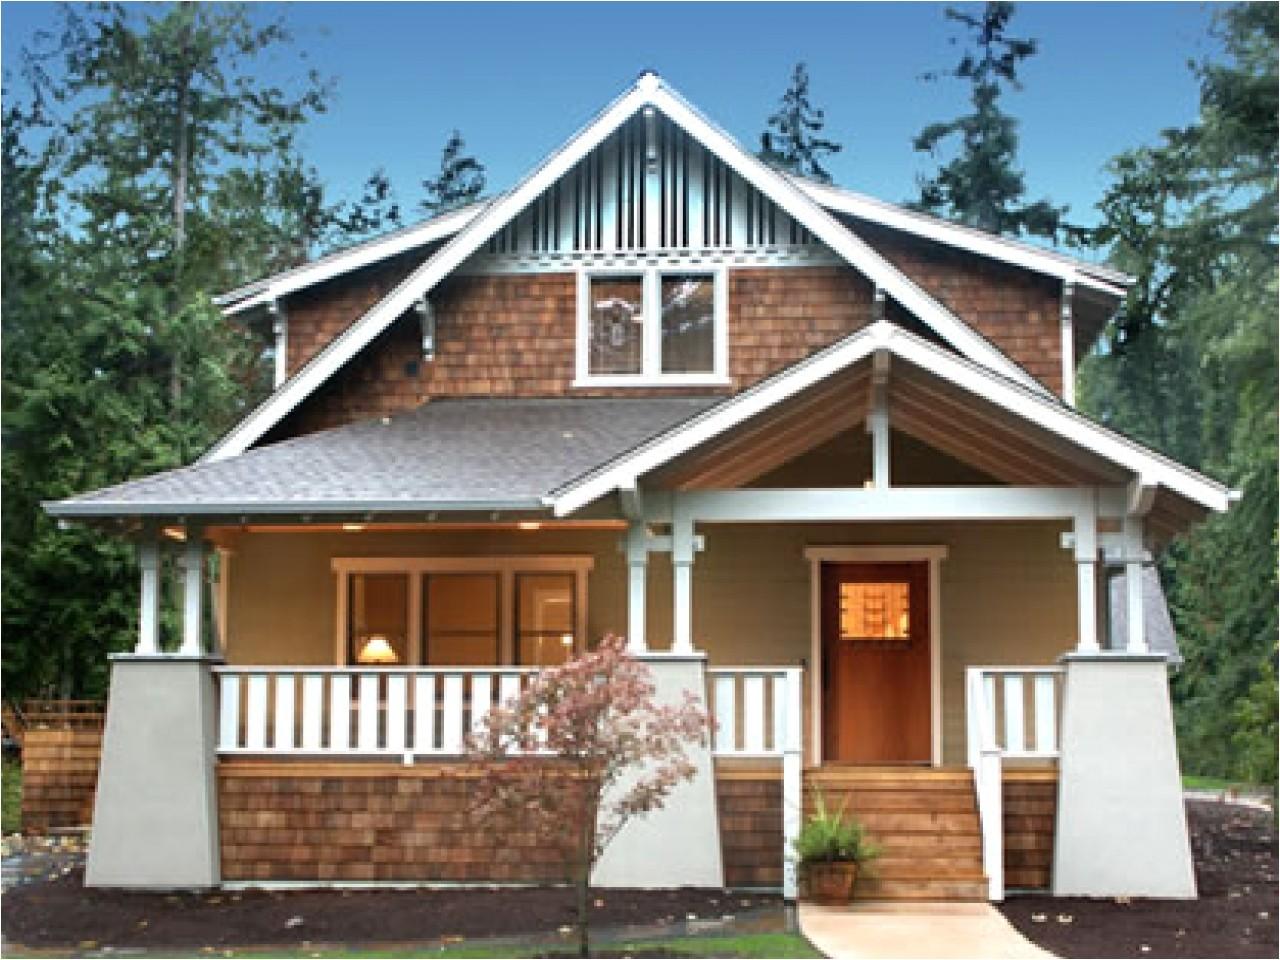 a7f8070c68d3c5e6 craftsman style kitchen craftsman style bungalow house plans